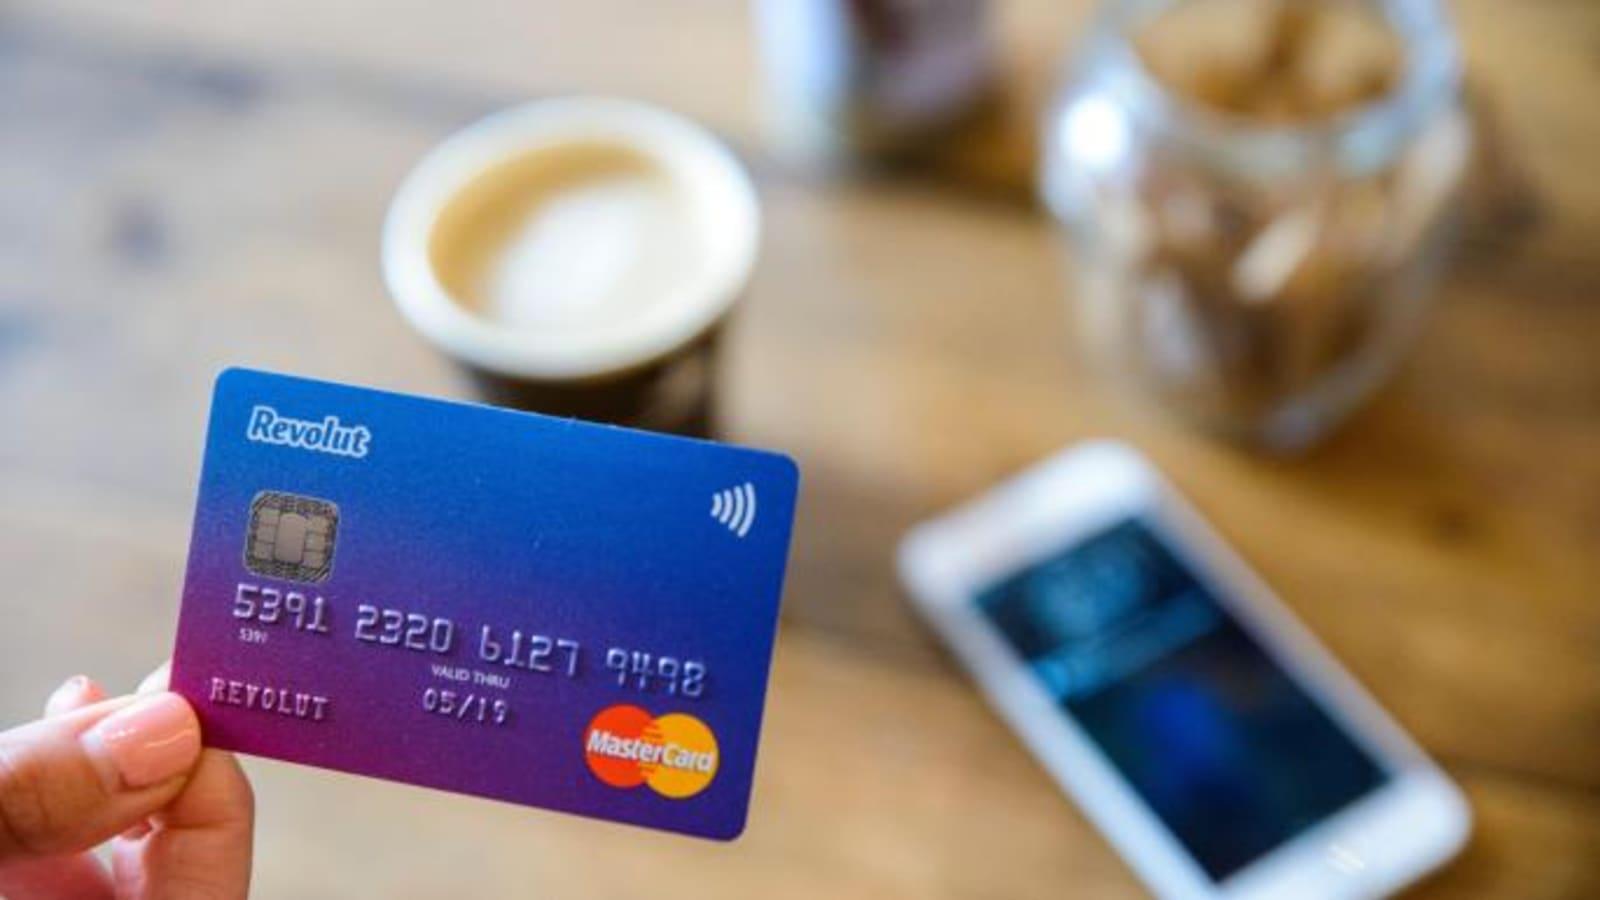 Fintech startup Revolut applies for European banking license